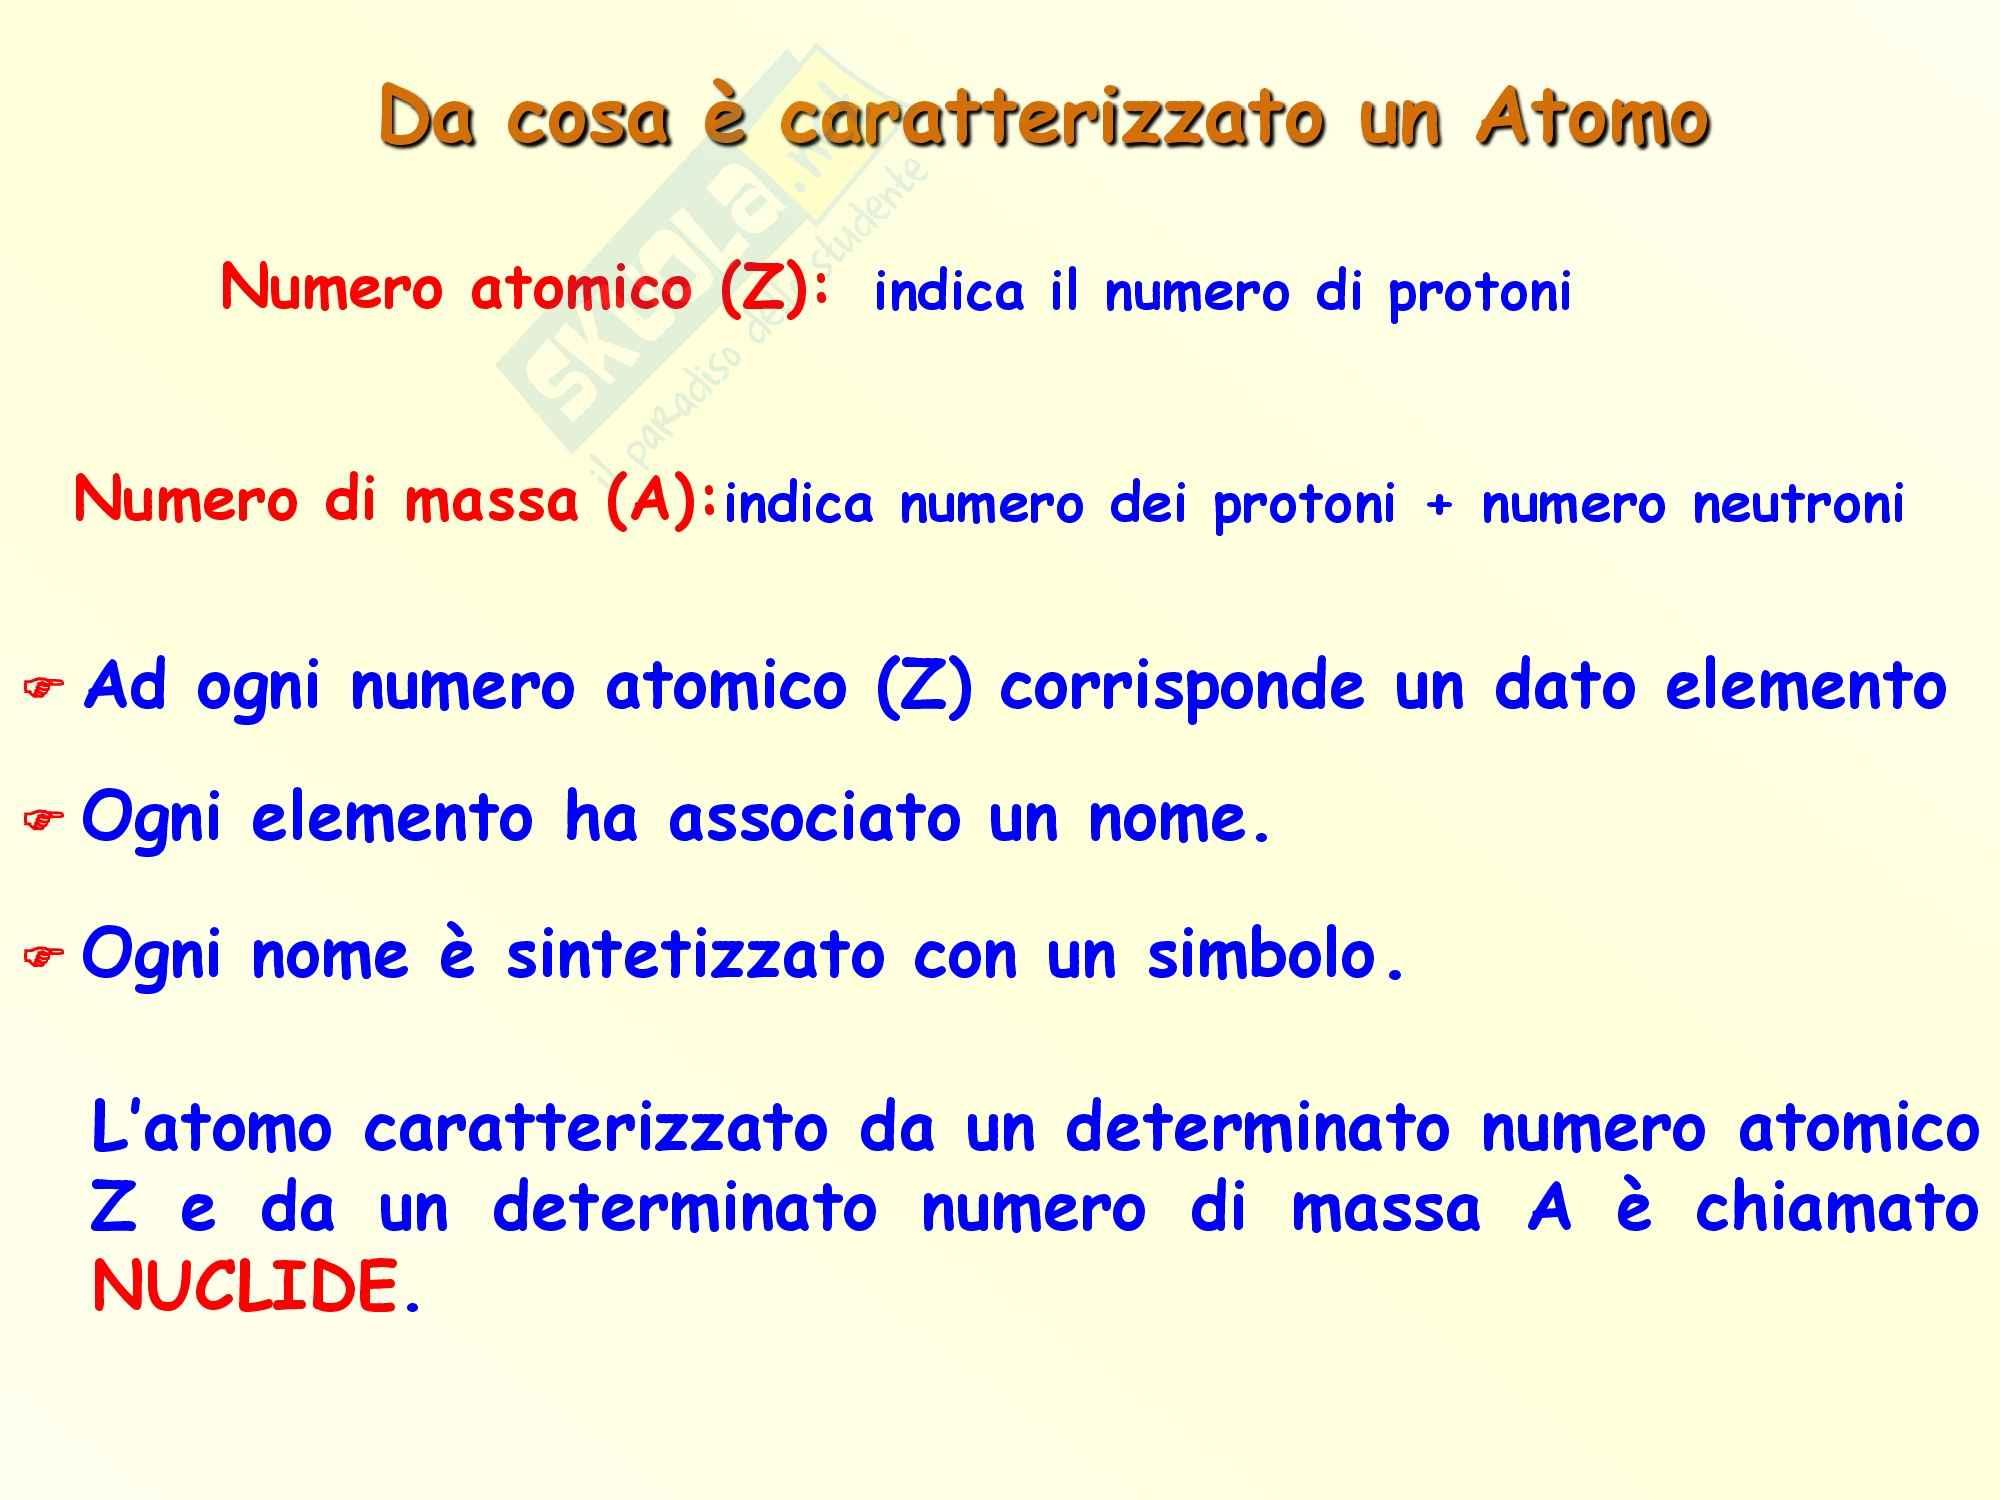 Chimica inorganica - l'atomo